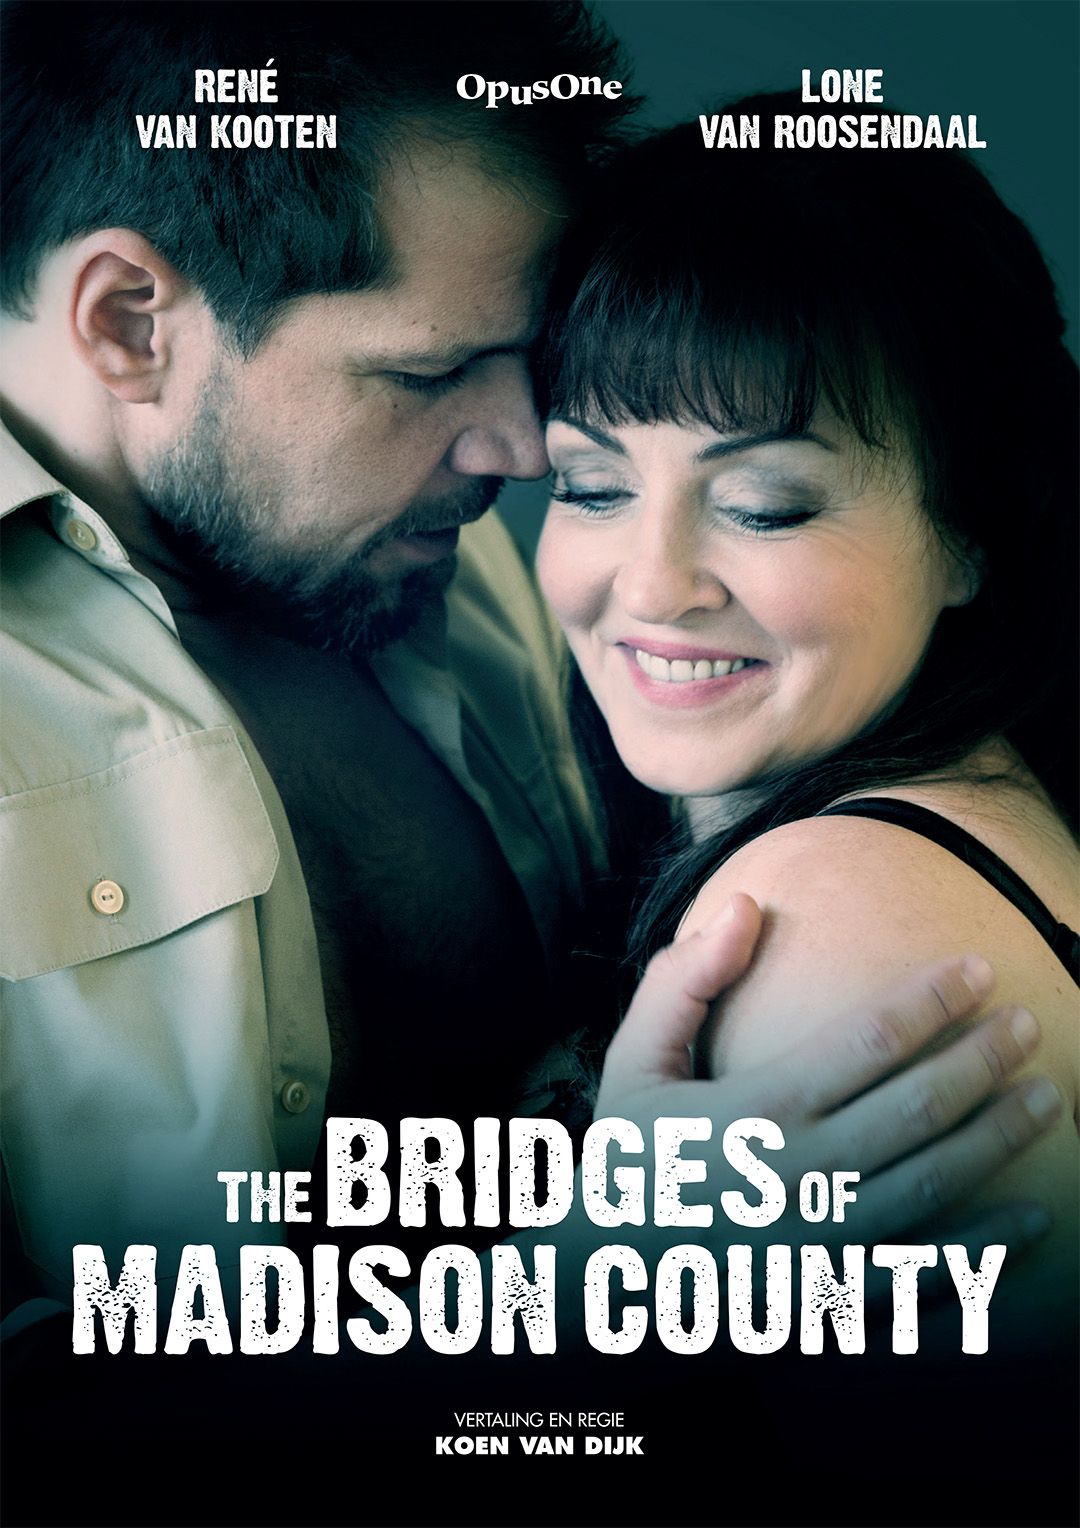 The Bridges of Madison County artwork